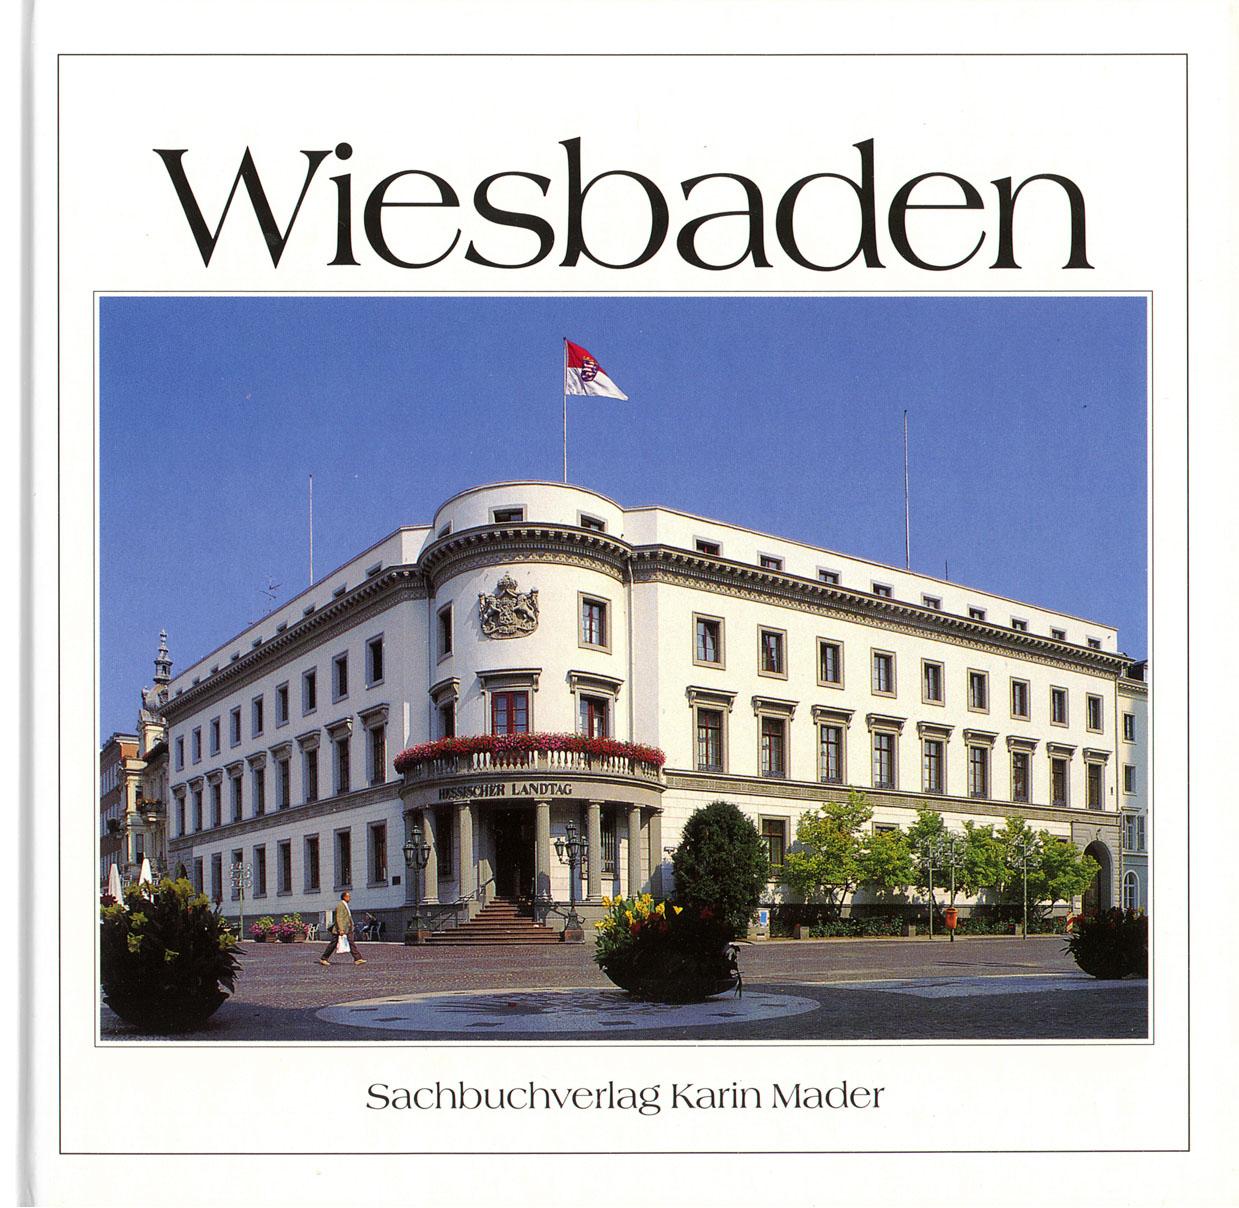 Wiesbaden kennenlernen